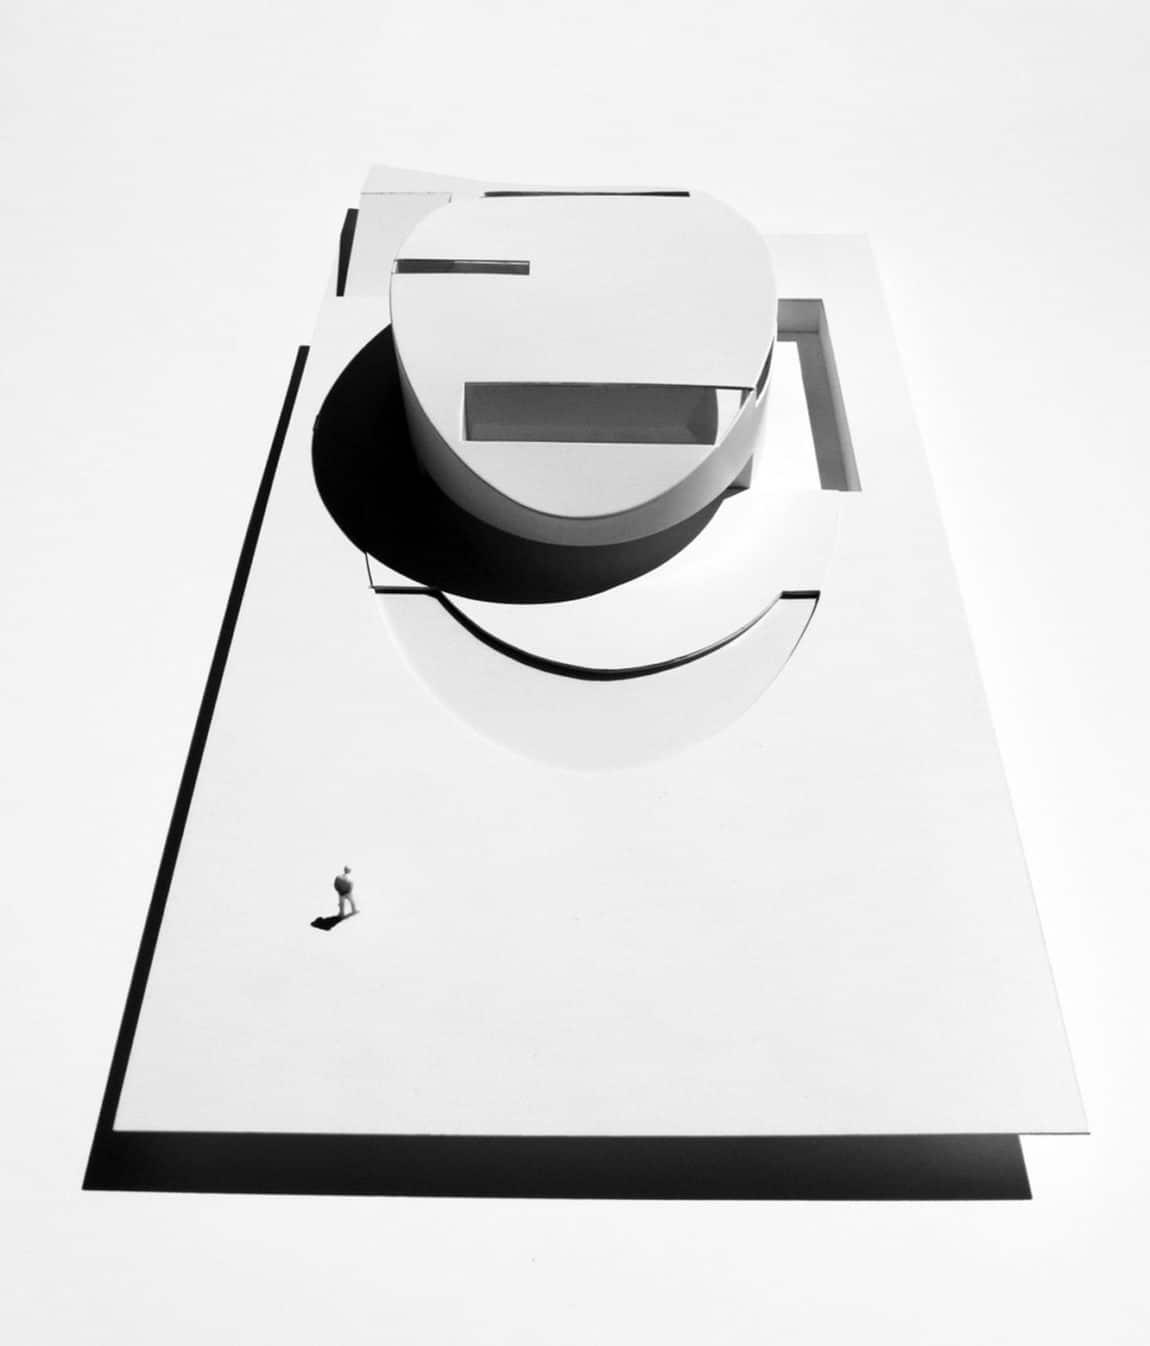 Casa Balint by Fran Silvestre Arquitectos (23)